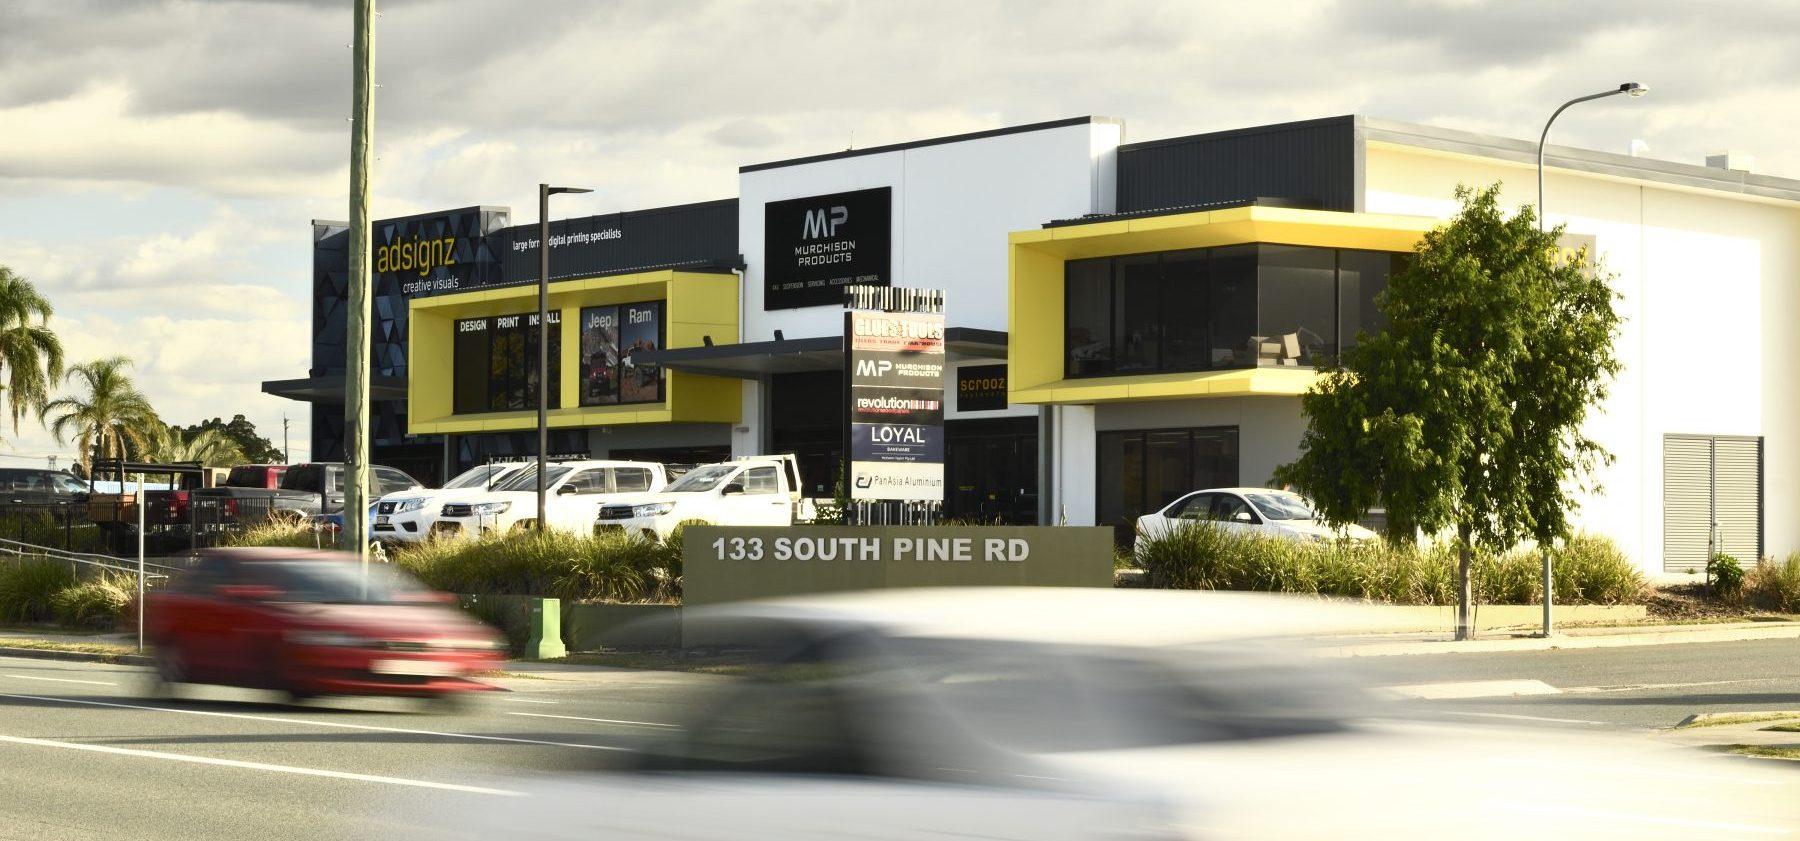 South Pine Road External Building